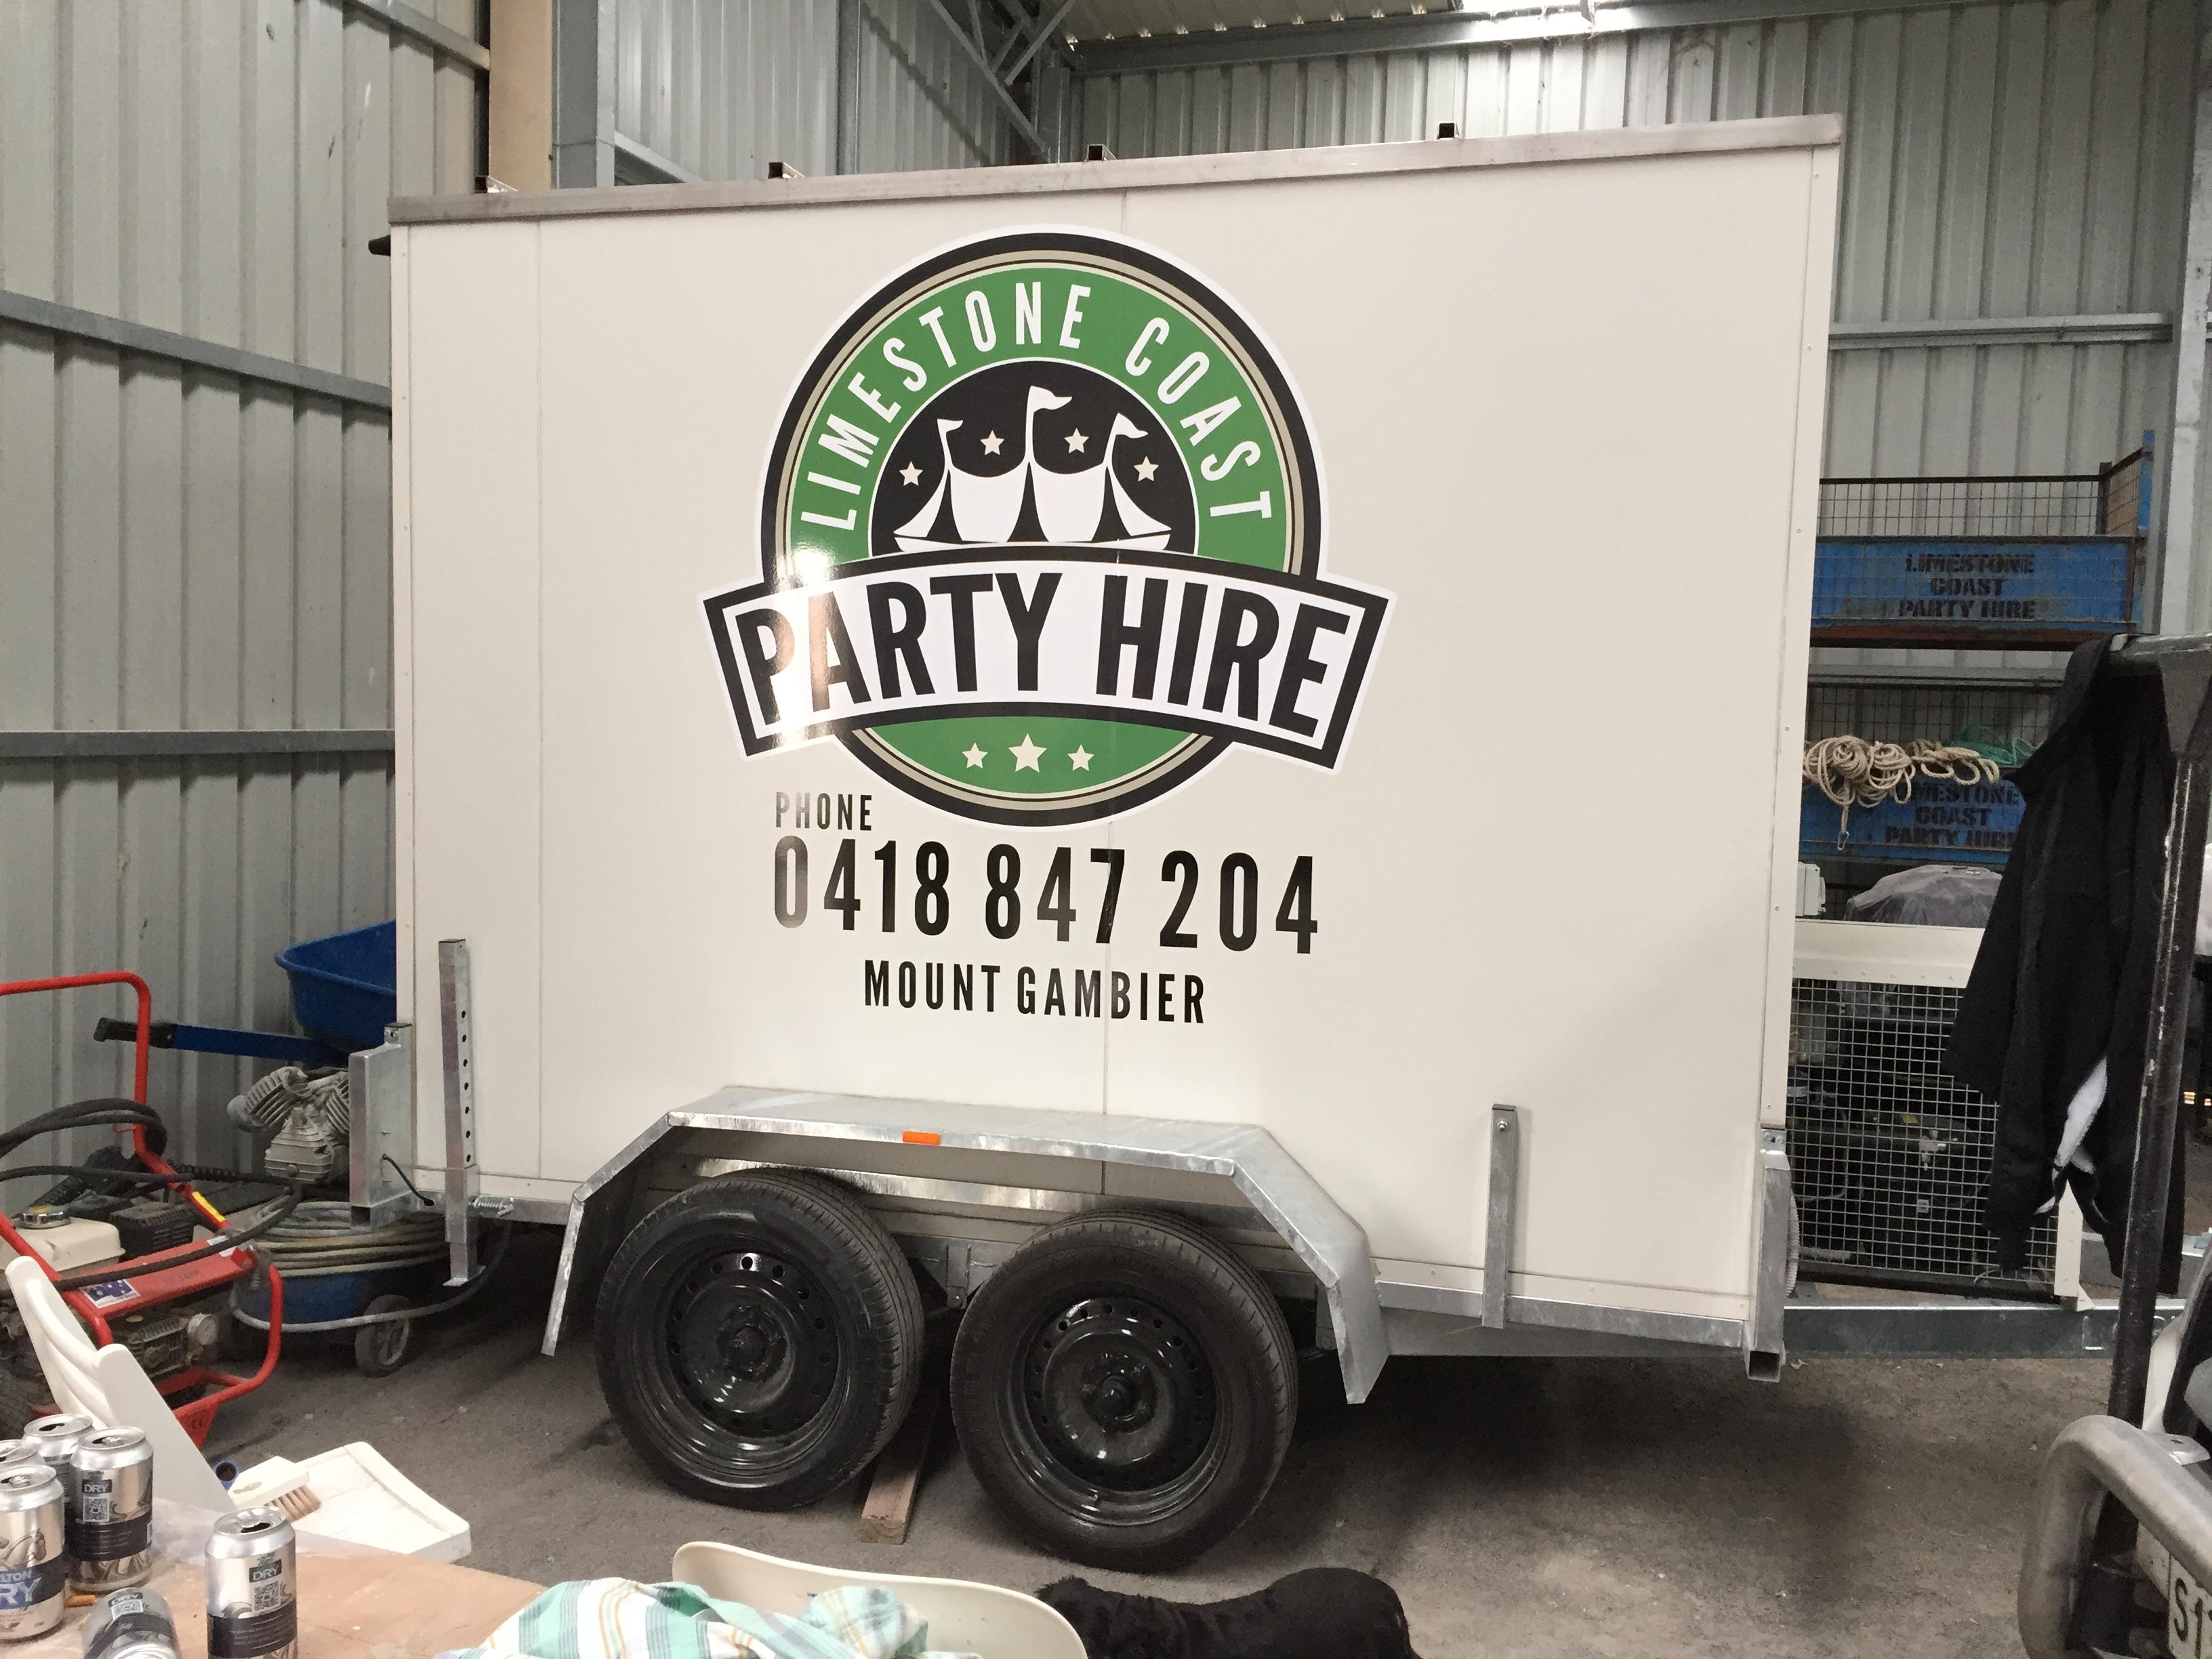 Limestone Coast Party Hire Truck